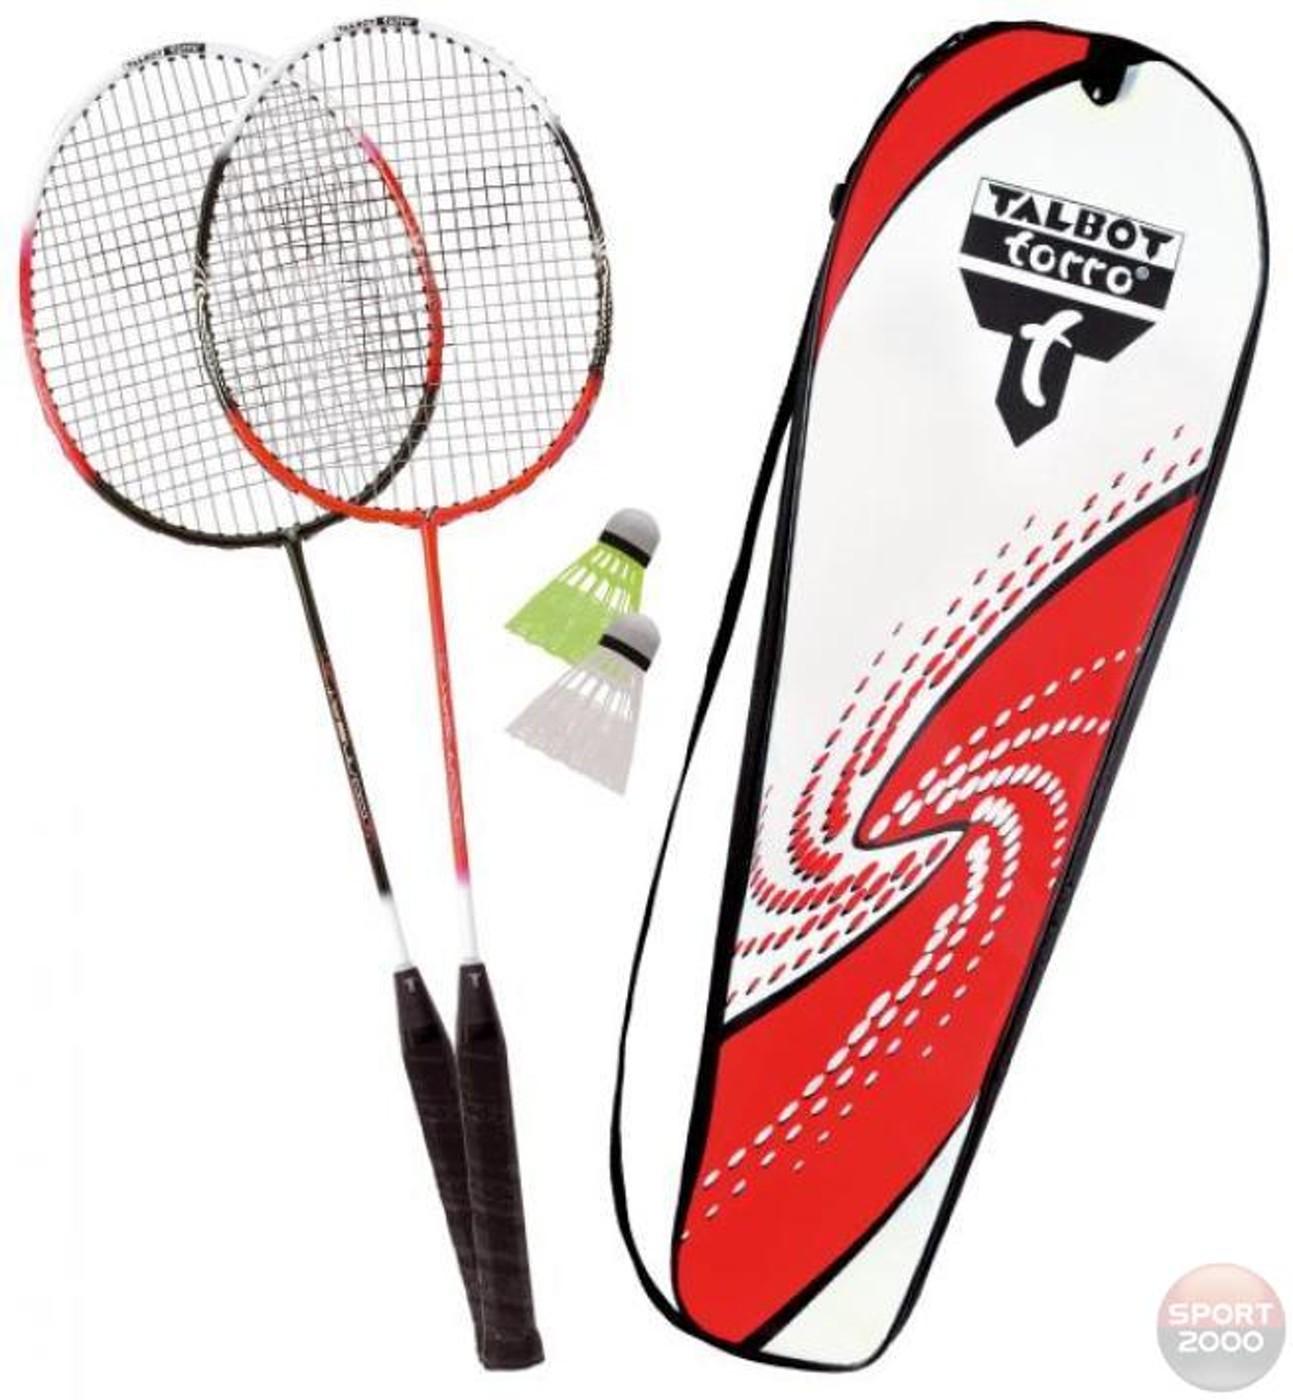 TALBOT TORRO Badmintonset 2 COMBAT